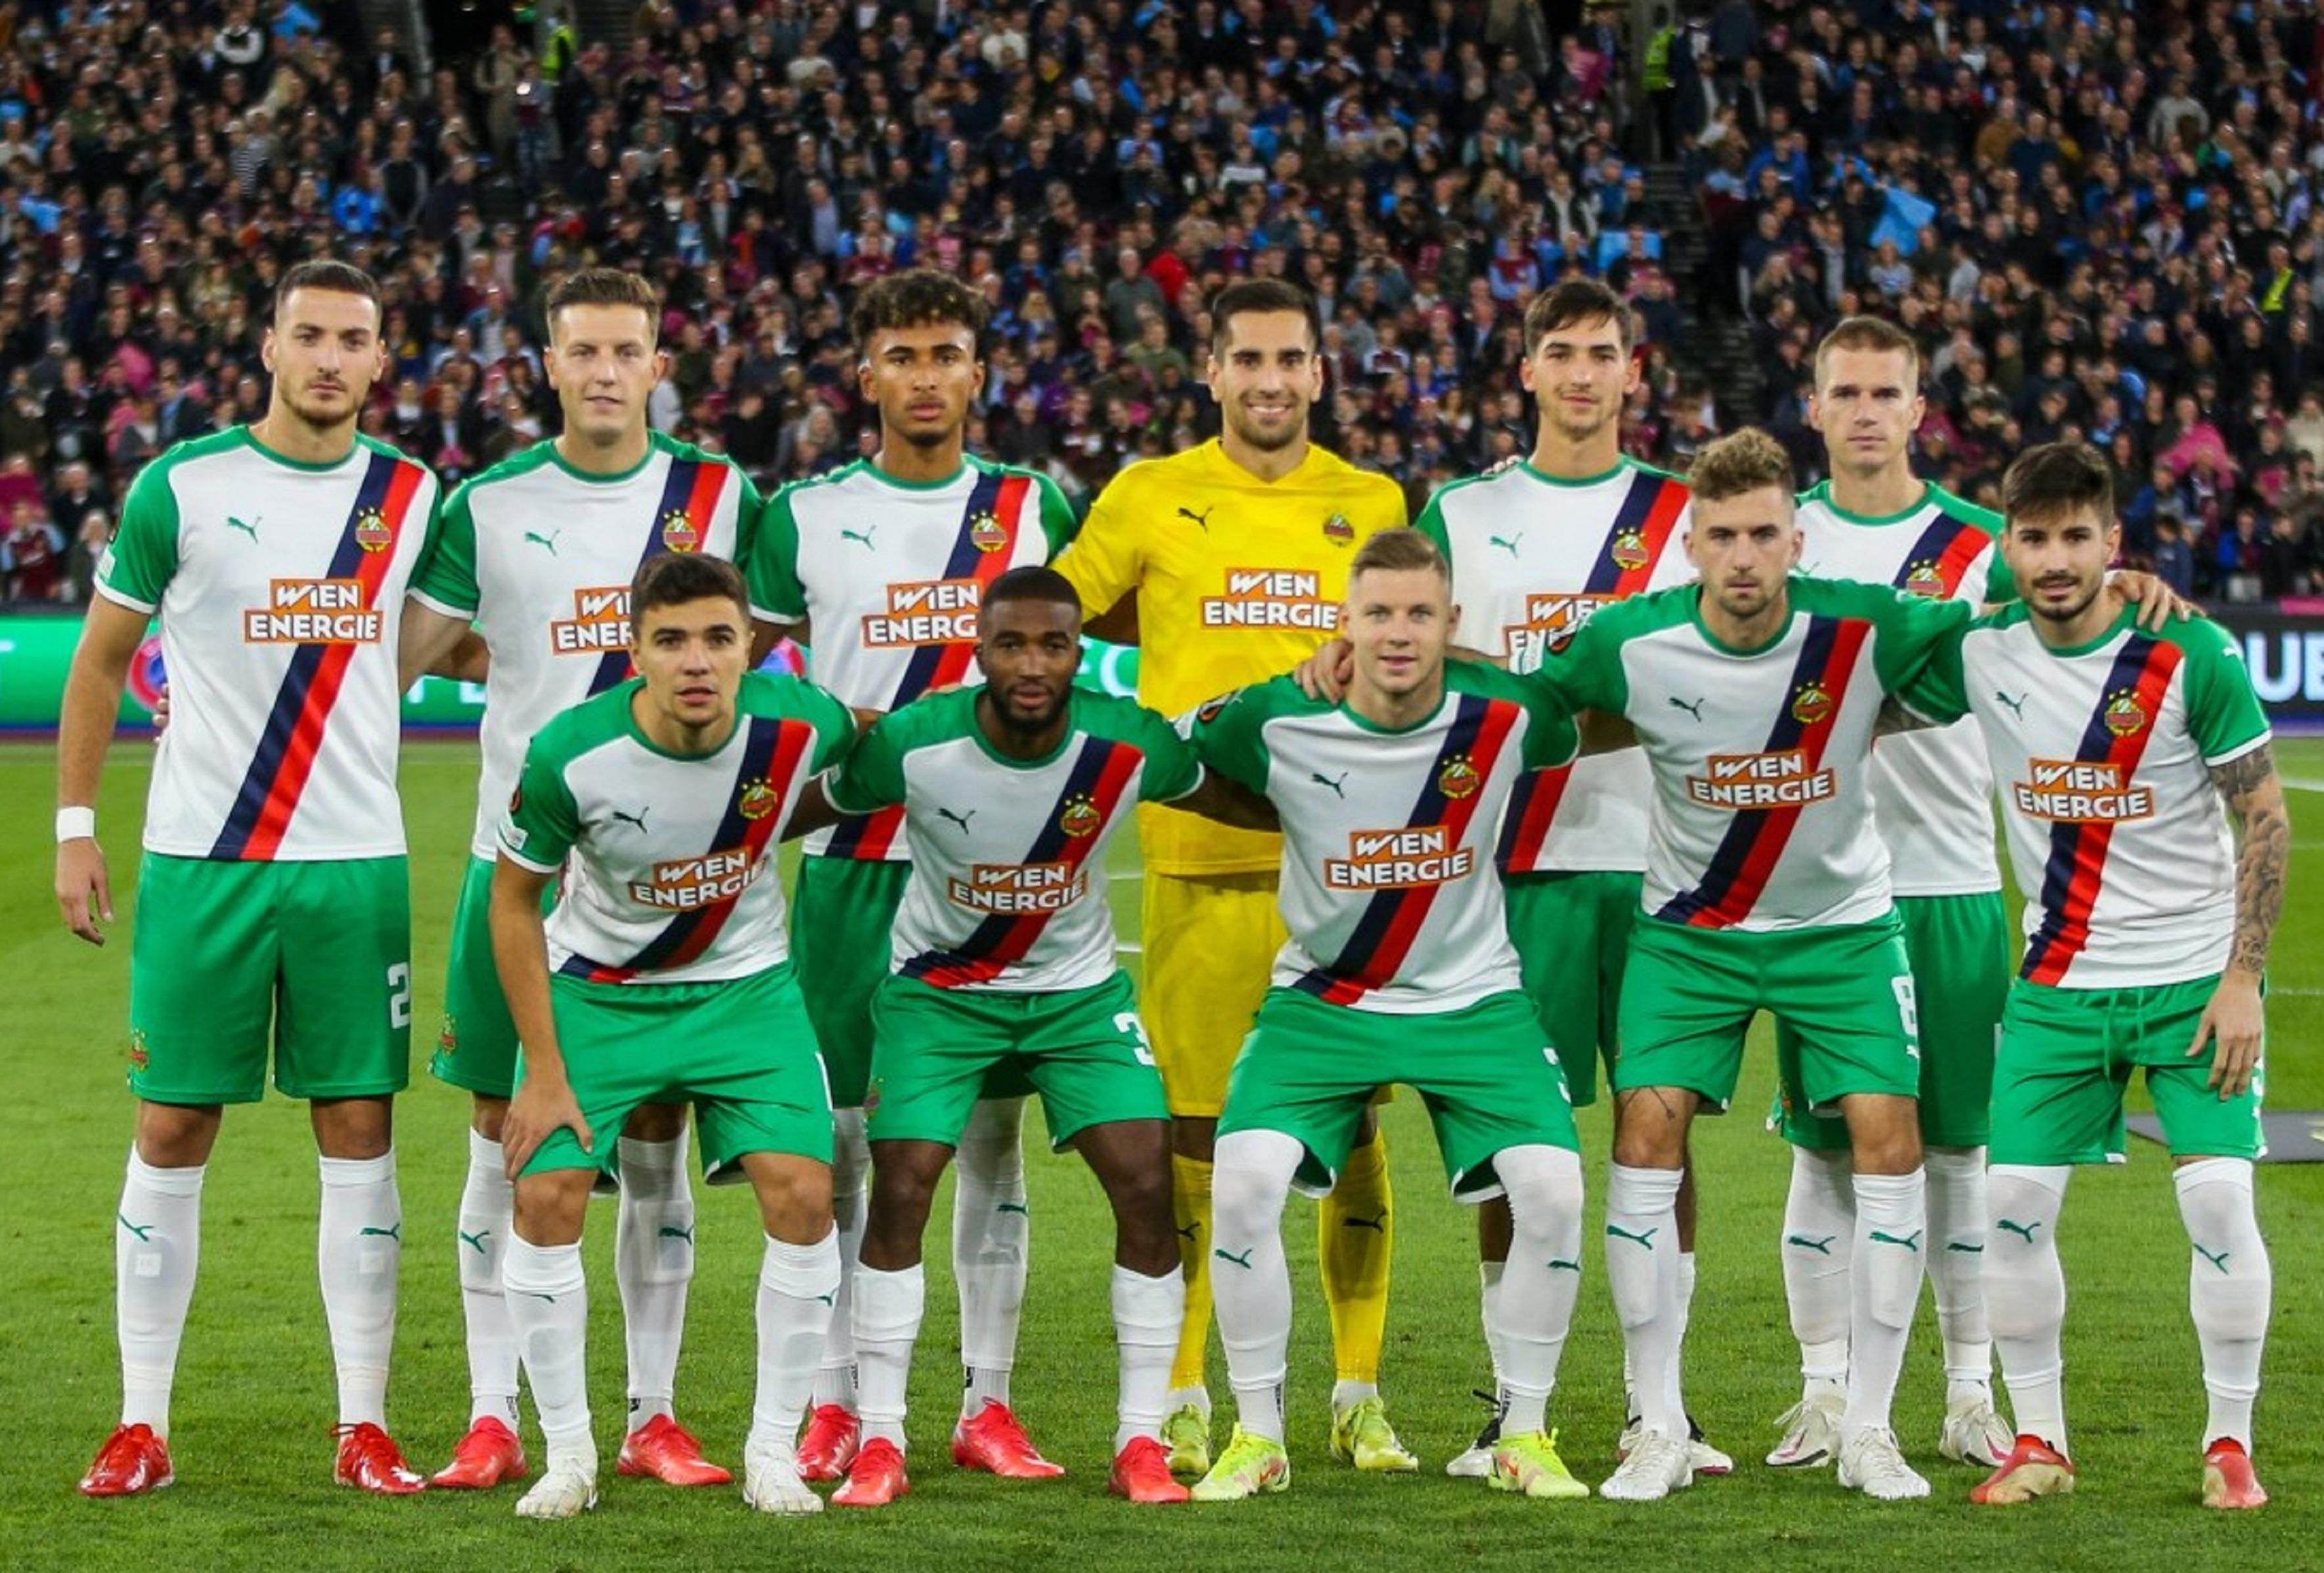 Вест Хэм (Англия) - Рапид (Австрия) 2:0